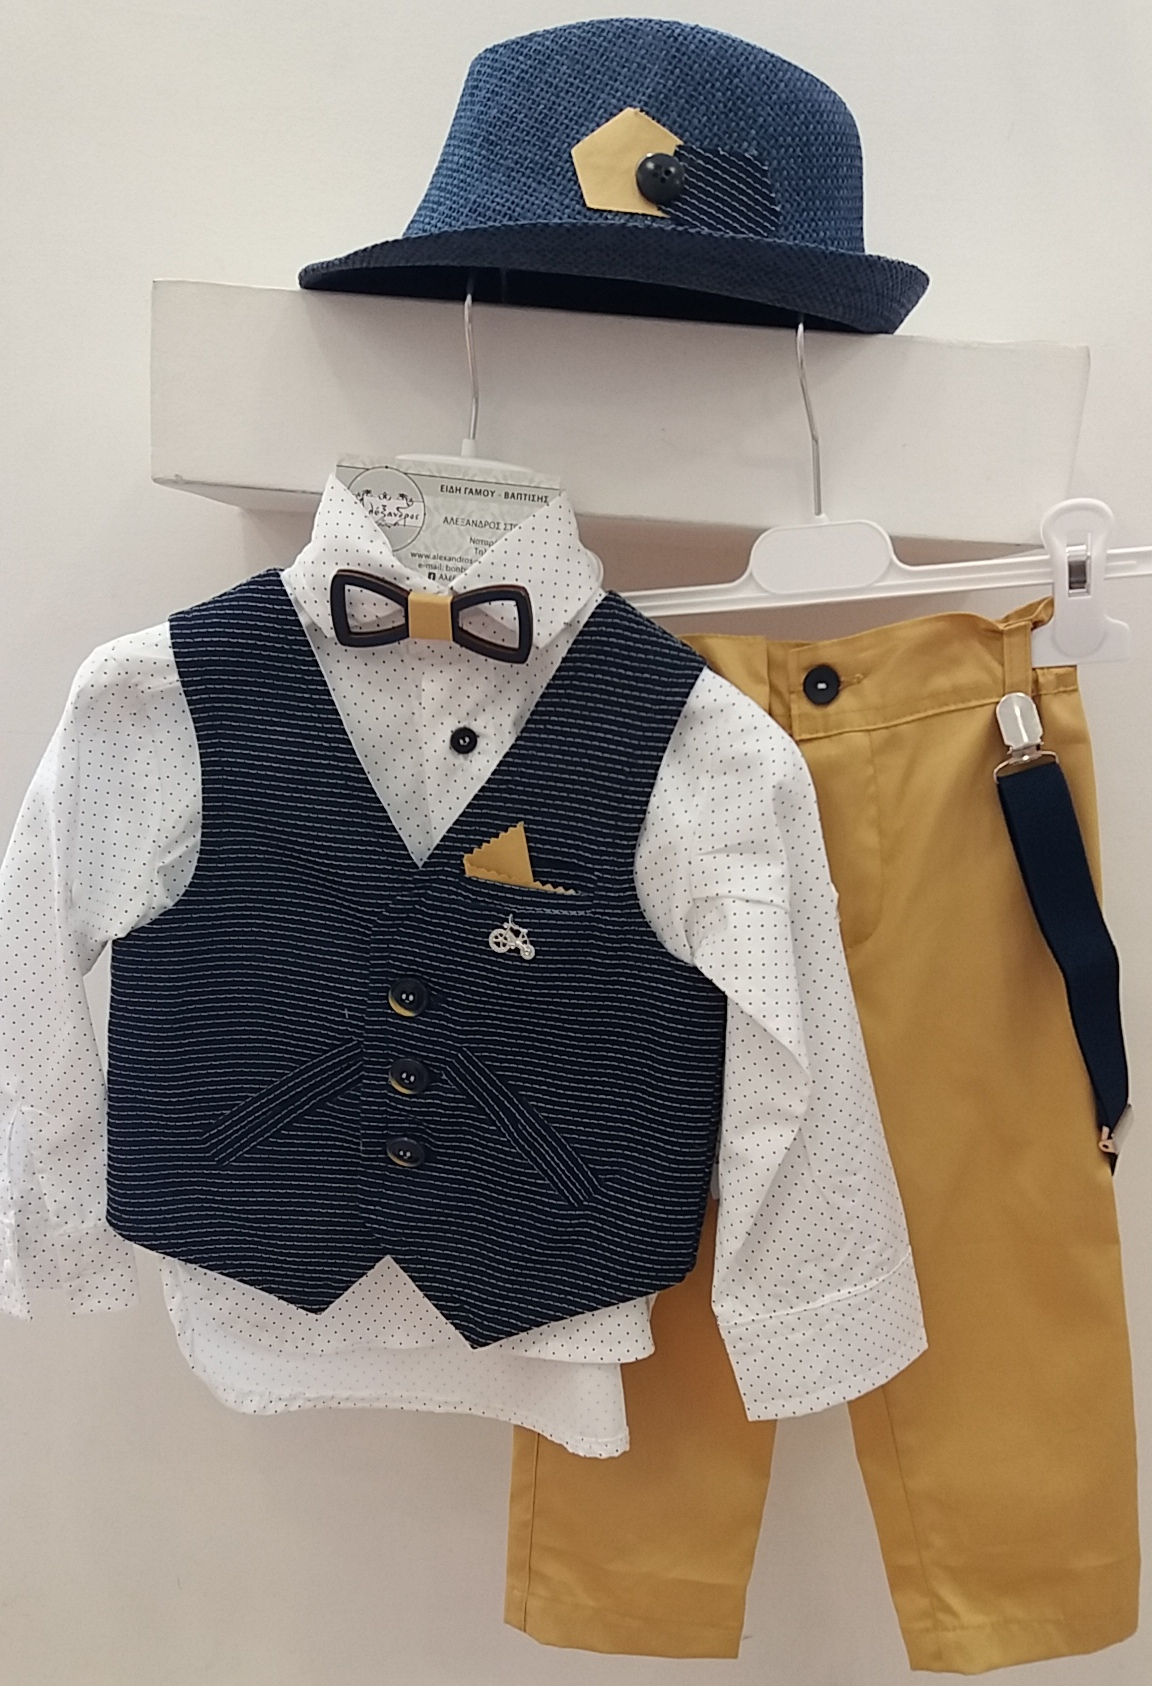 b73d3712920 Bαπτιστικο για αγορι κοστουμι σετ πακετο βαπτισης Makis Tselios μπλε  μουσταρδι